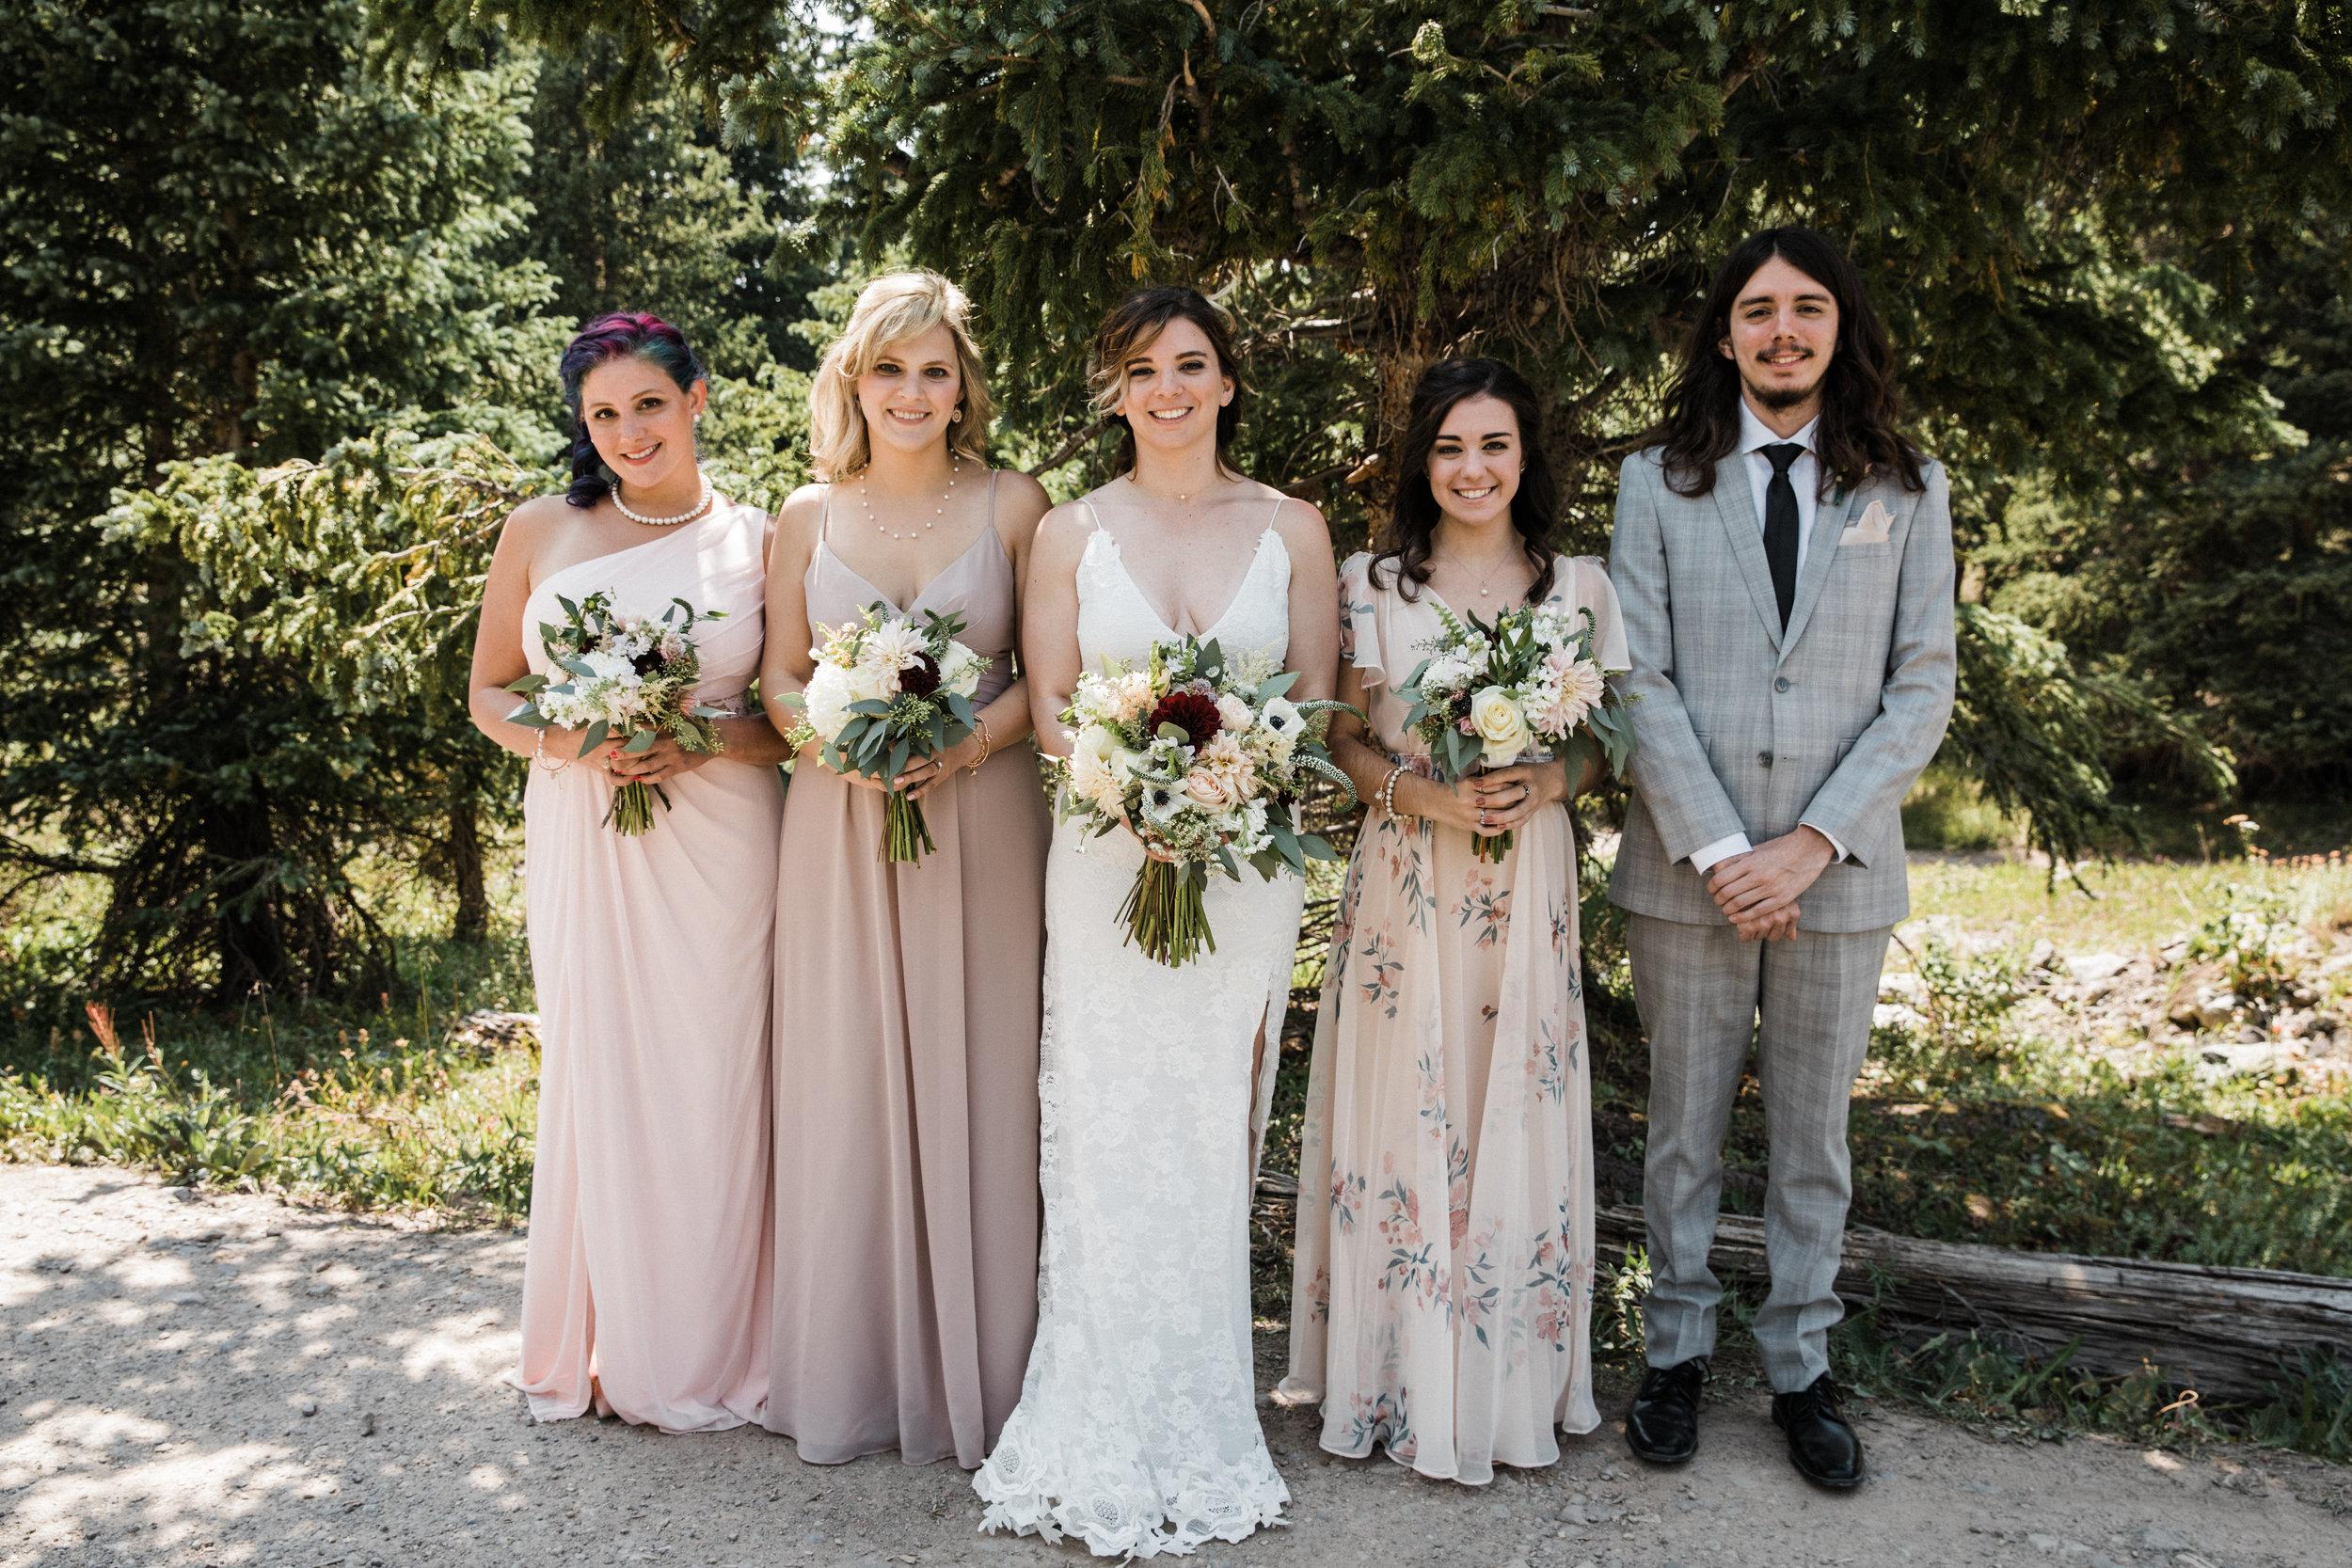 SB-leahandashton-telluride-wedding-photography-0014.jpg